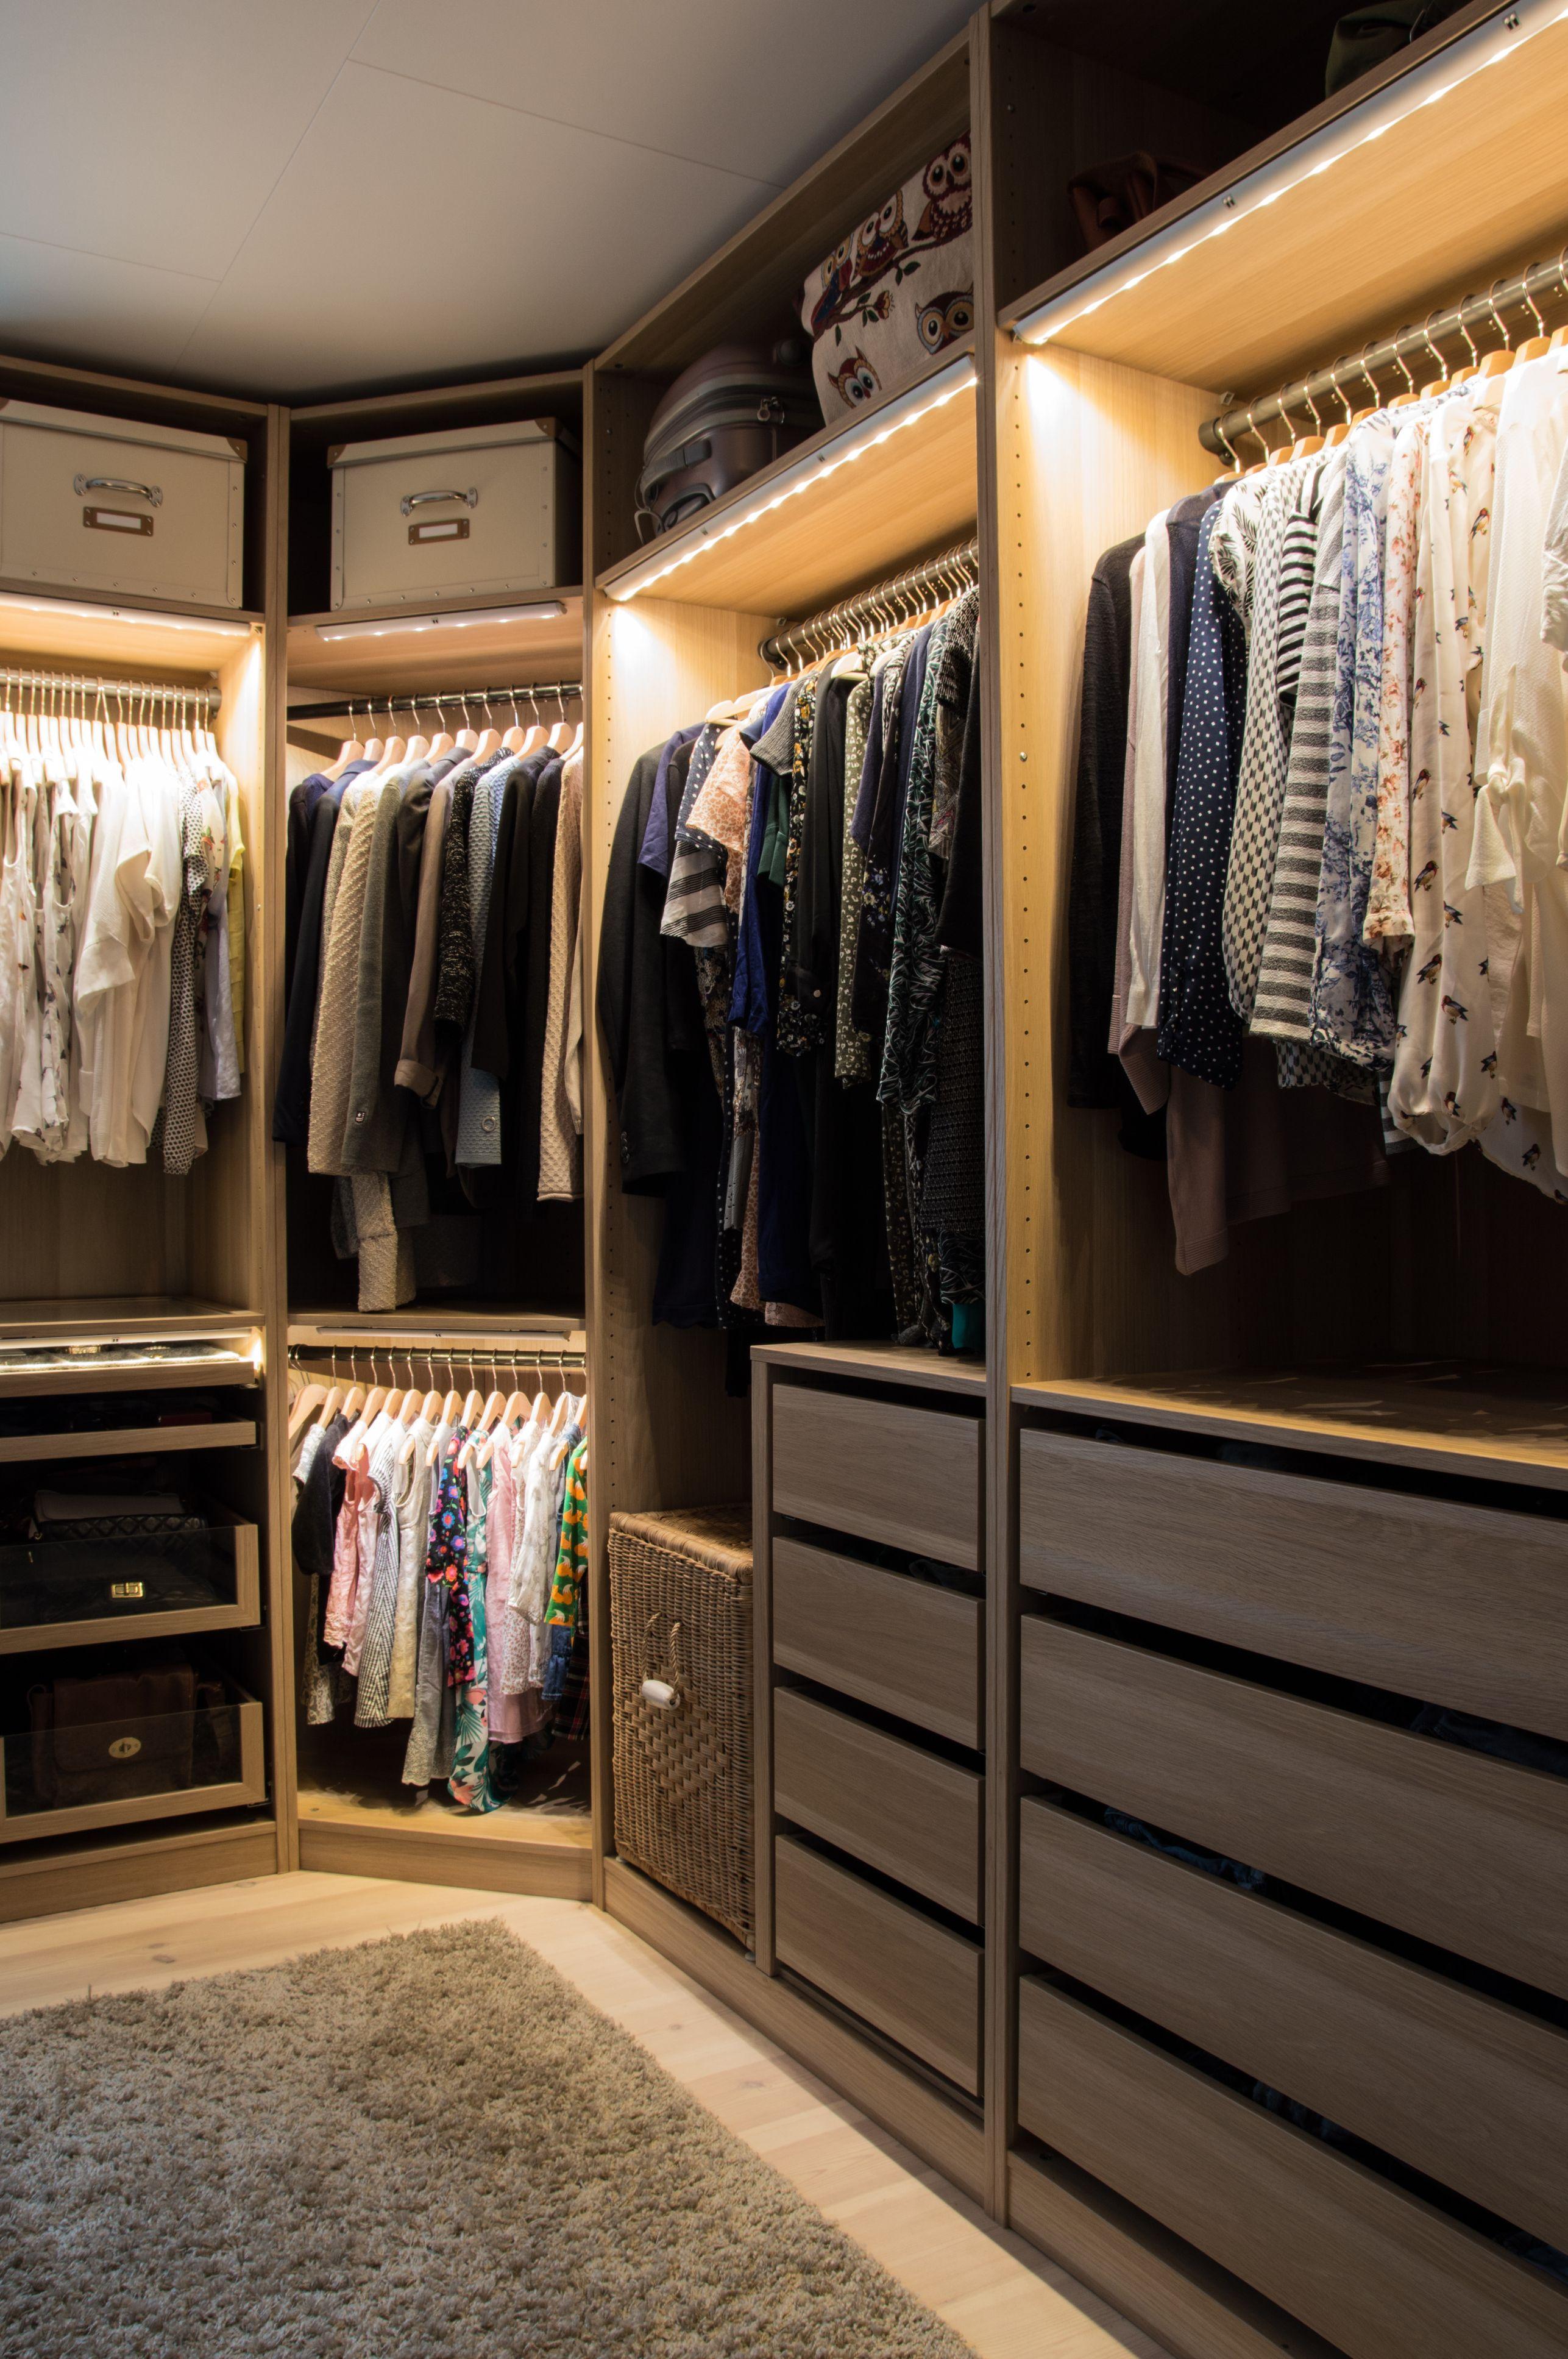 11 Small Walk In Closet Ideas And Organizer Designs Closet Remodel Bedroom Closet Design Closet Layout